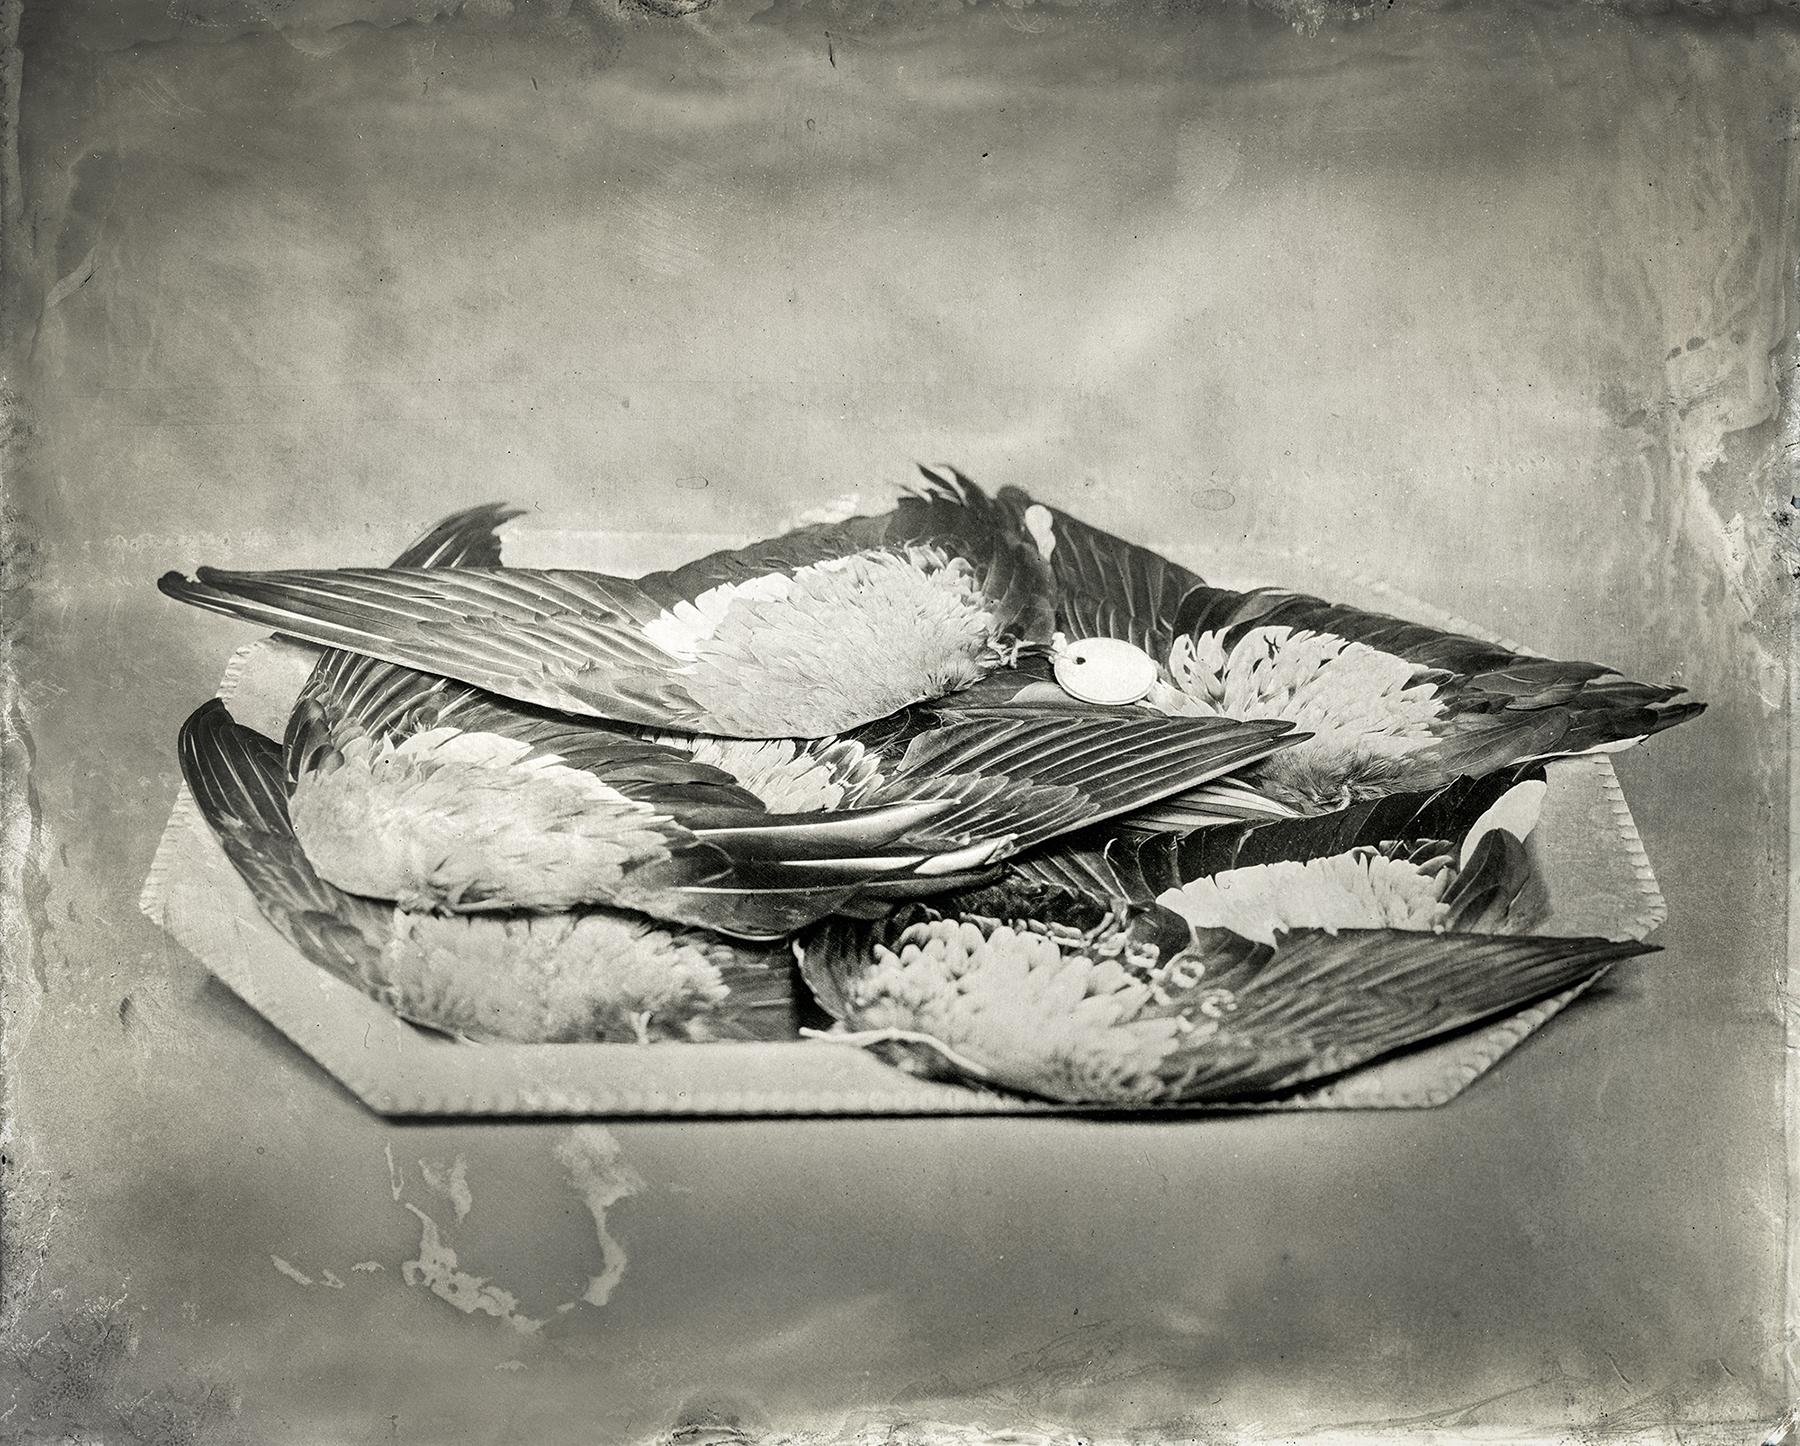 Christine_Fitzgerald_TRAFFICKED_Platter of Duck Wings_06.jpg